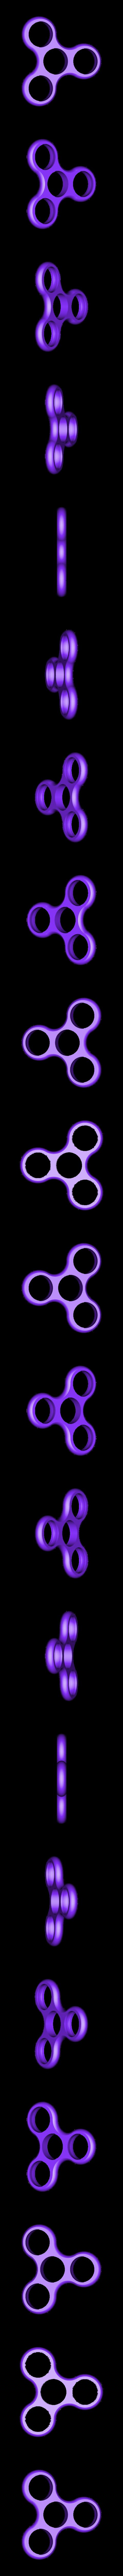 spinner_balls.stl Télécharger fichier STL gratuit Heavy Ball Spinner • Design à imprimer en 3D, bda